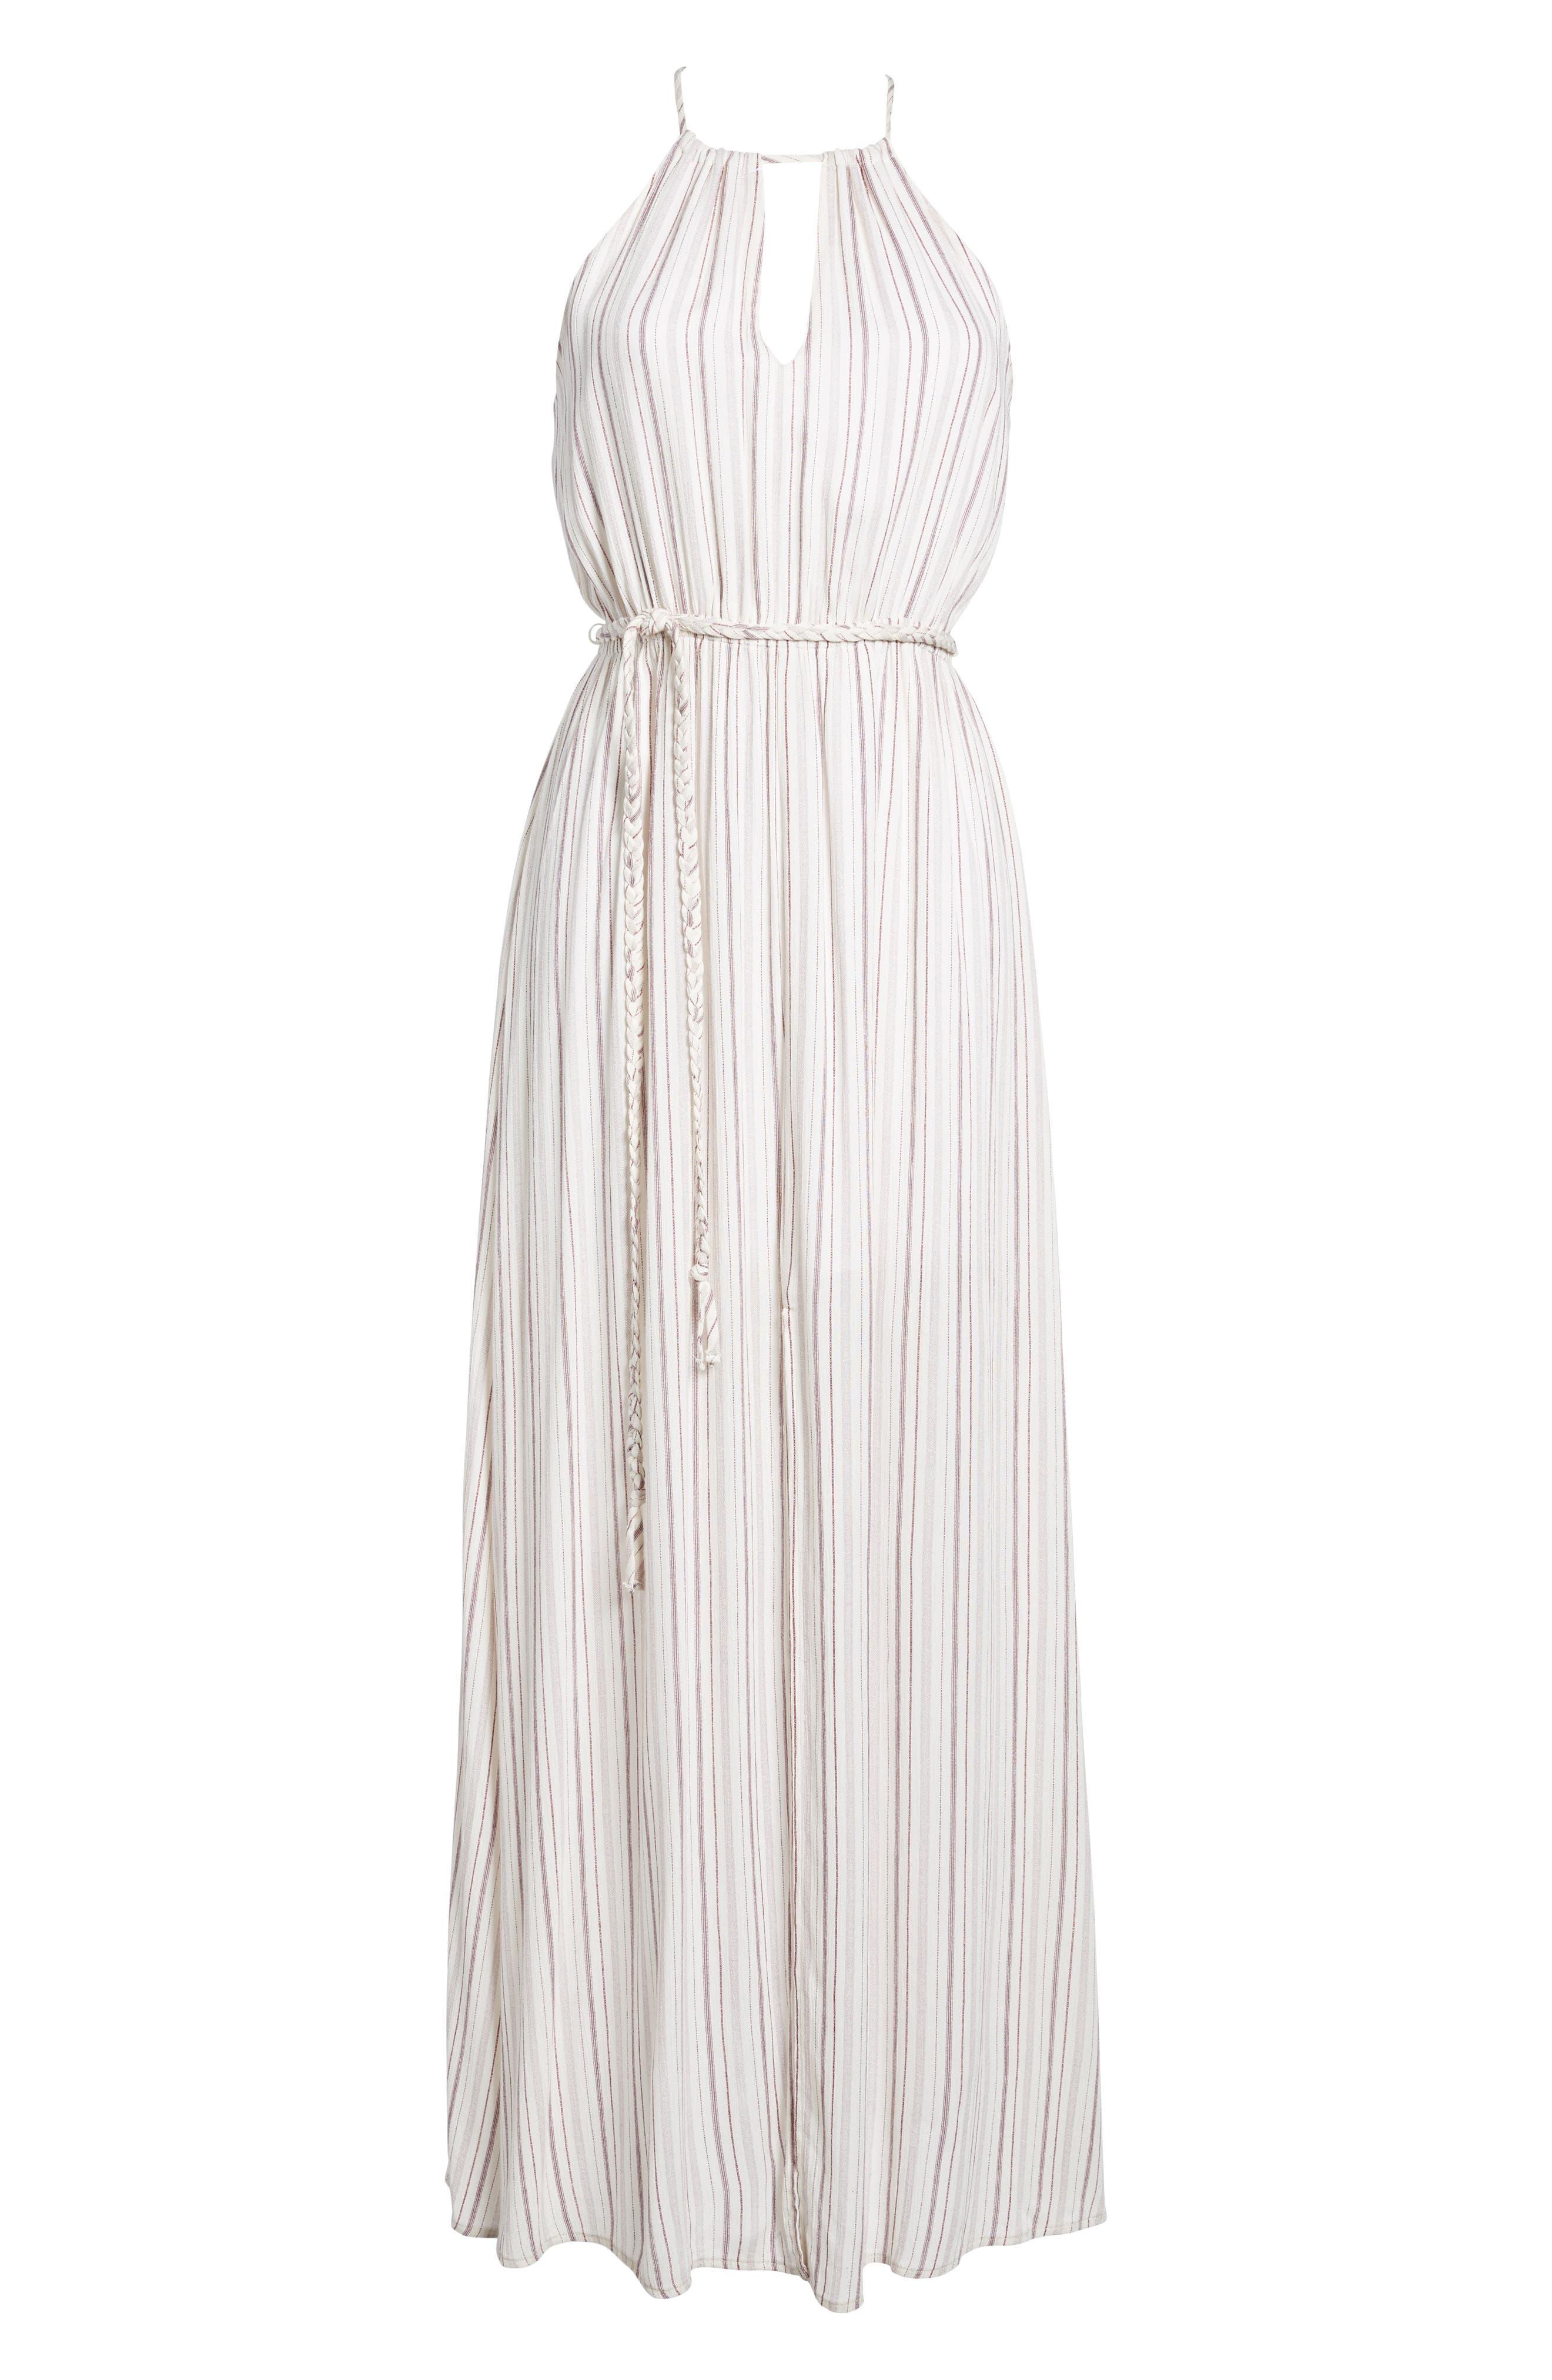 Daydreamer Stripe Maxi Dress,                             Alternate thumbnail 6, color,                             Ivory/ Mauve